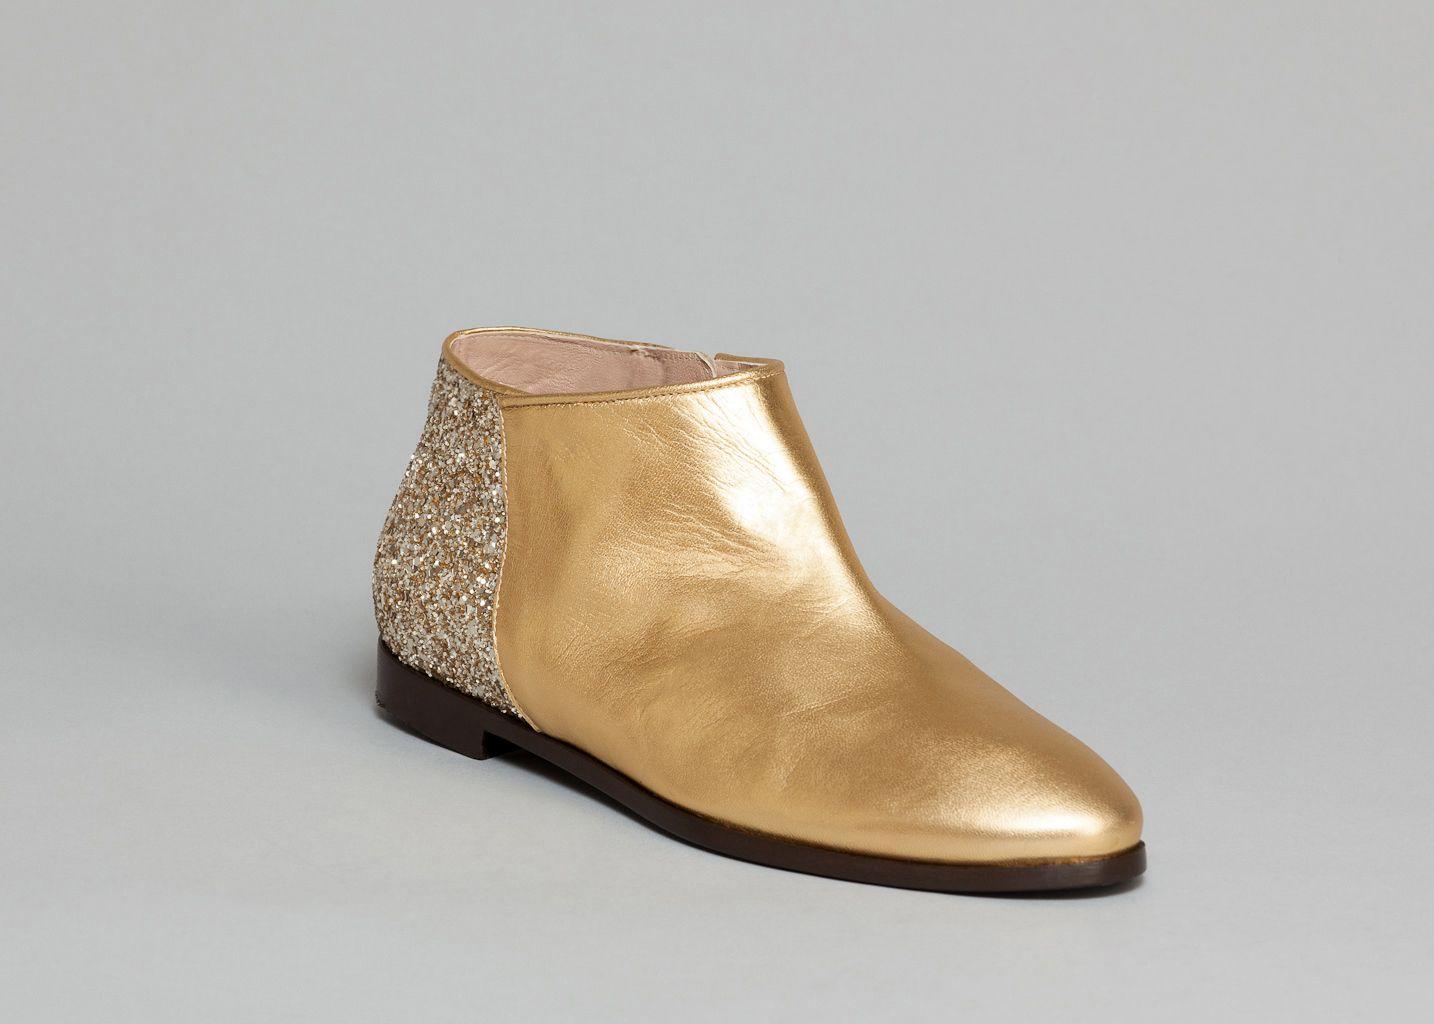 Ringo Low Boots - Jancovek